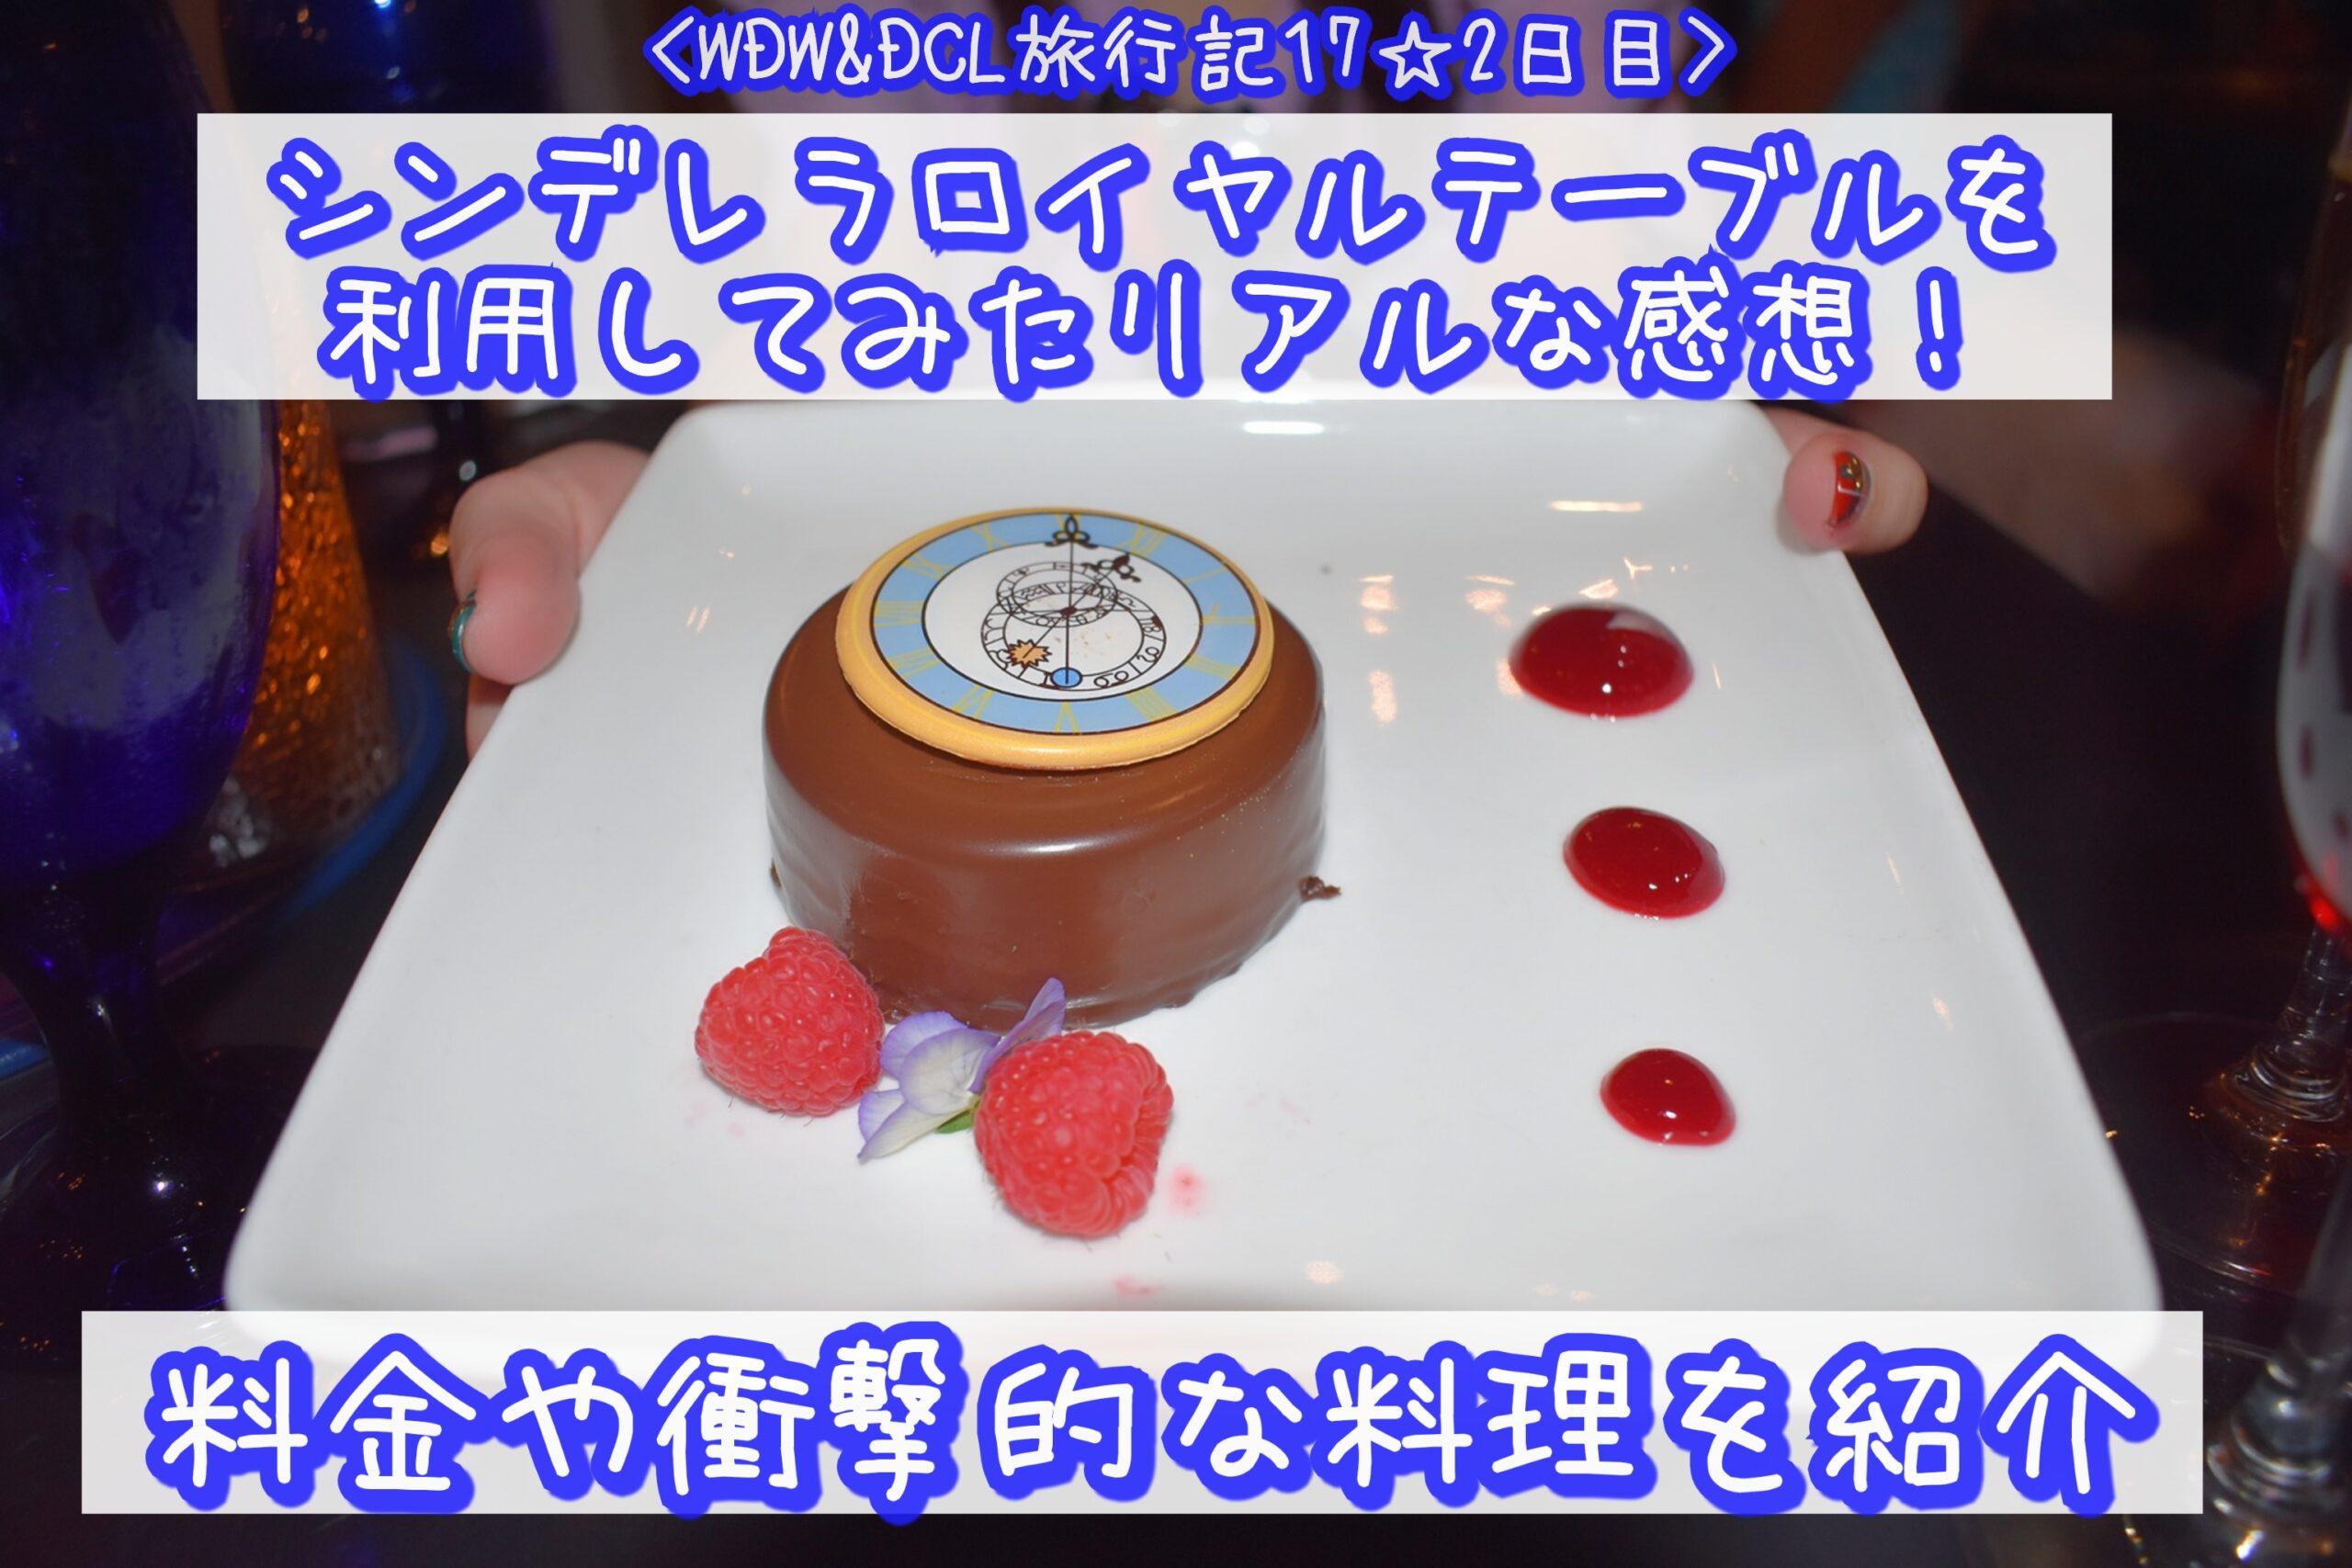 【WDW&DCL】シンデレラロイヤルテーブルを利用してみたリアルな感想!料金や衝撃的な料理を紹介